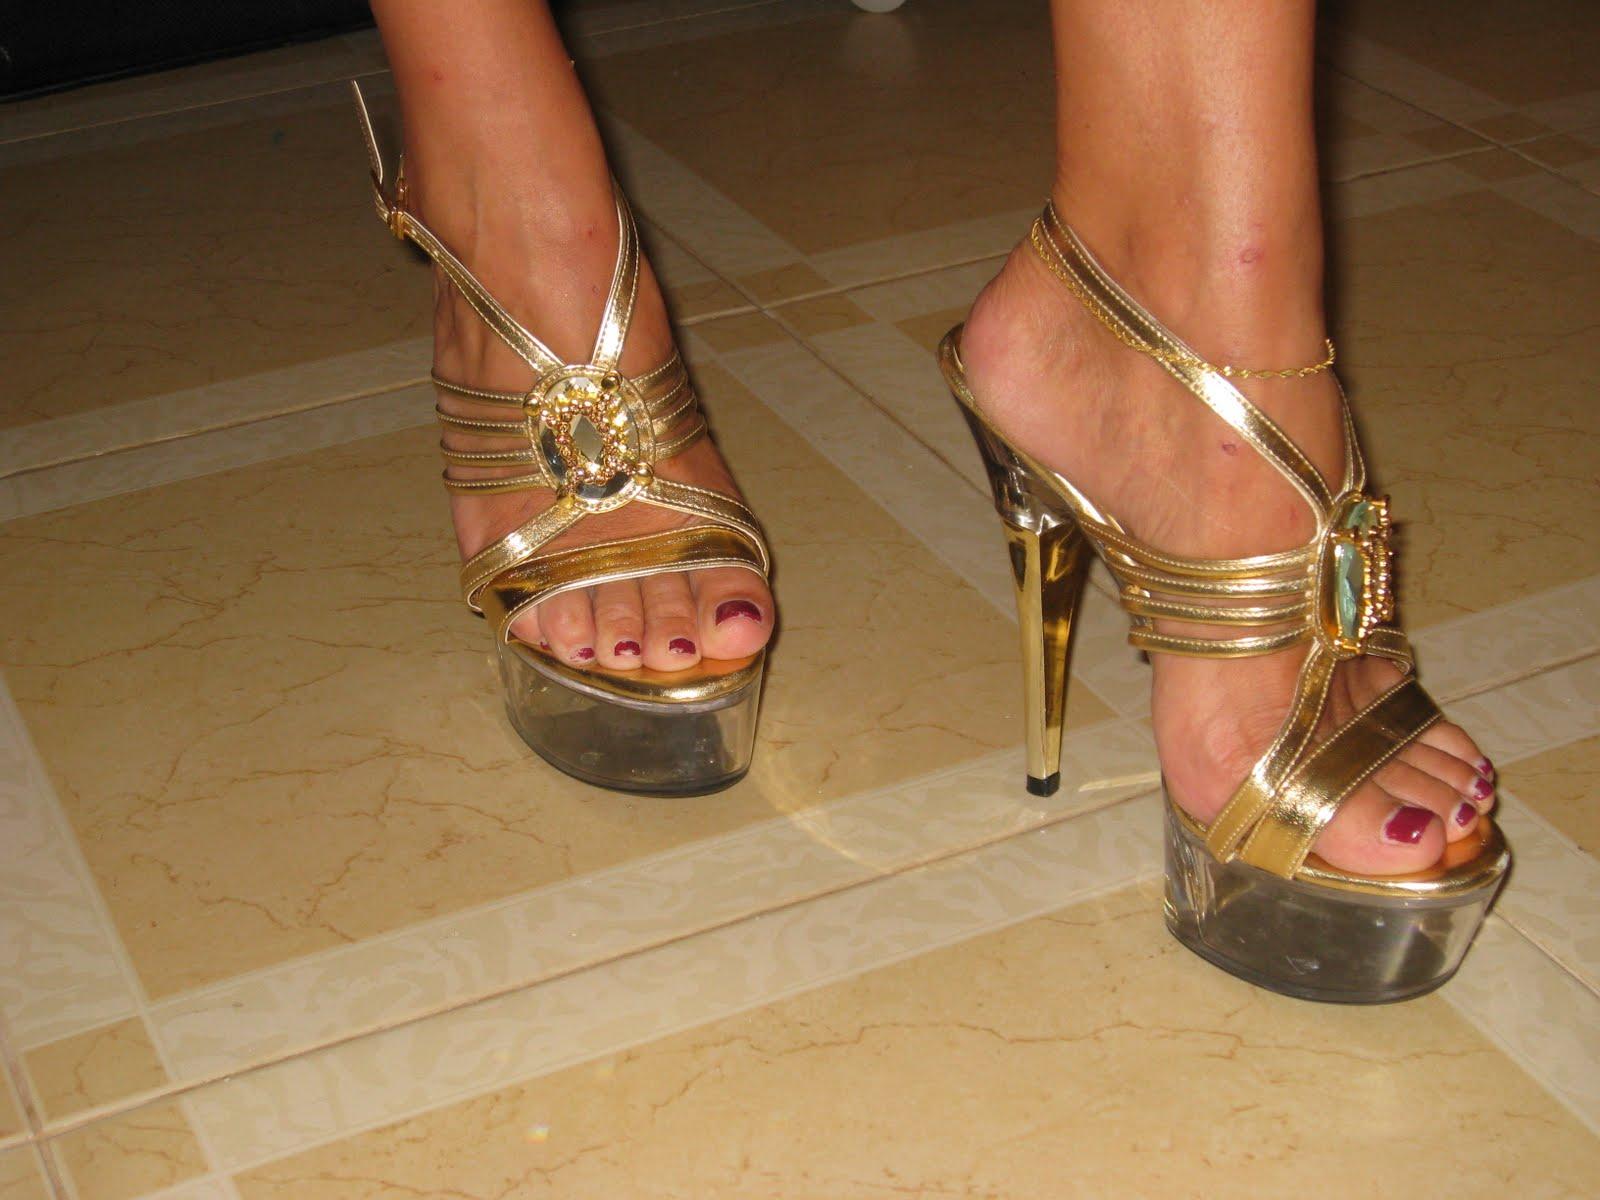 Sexiga kändis fötter